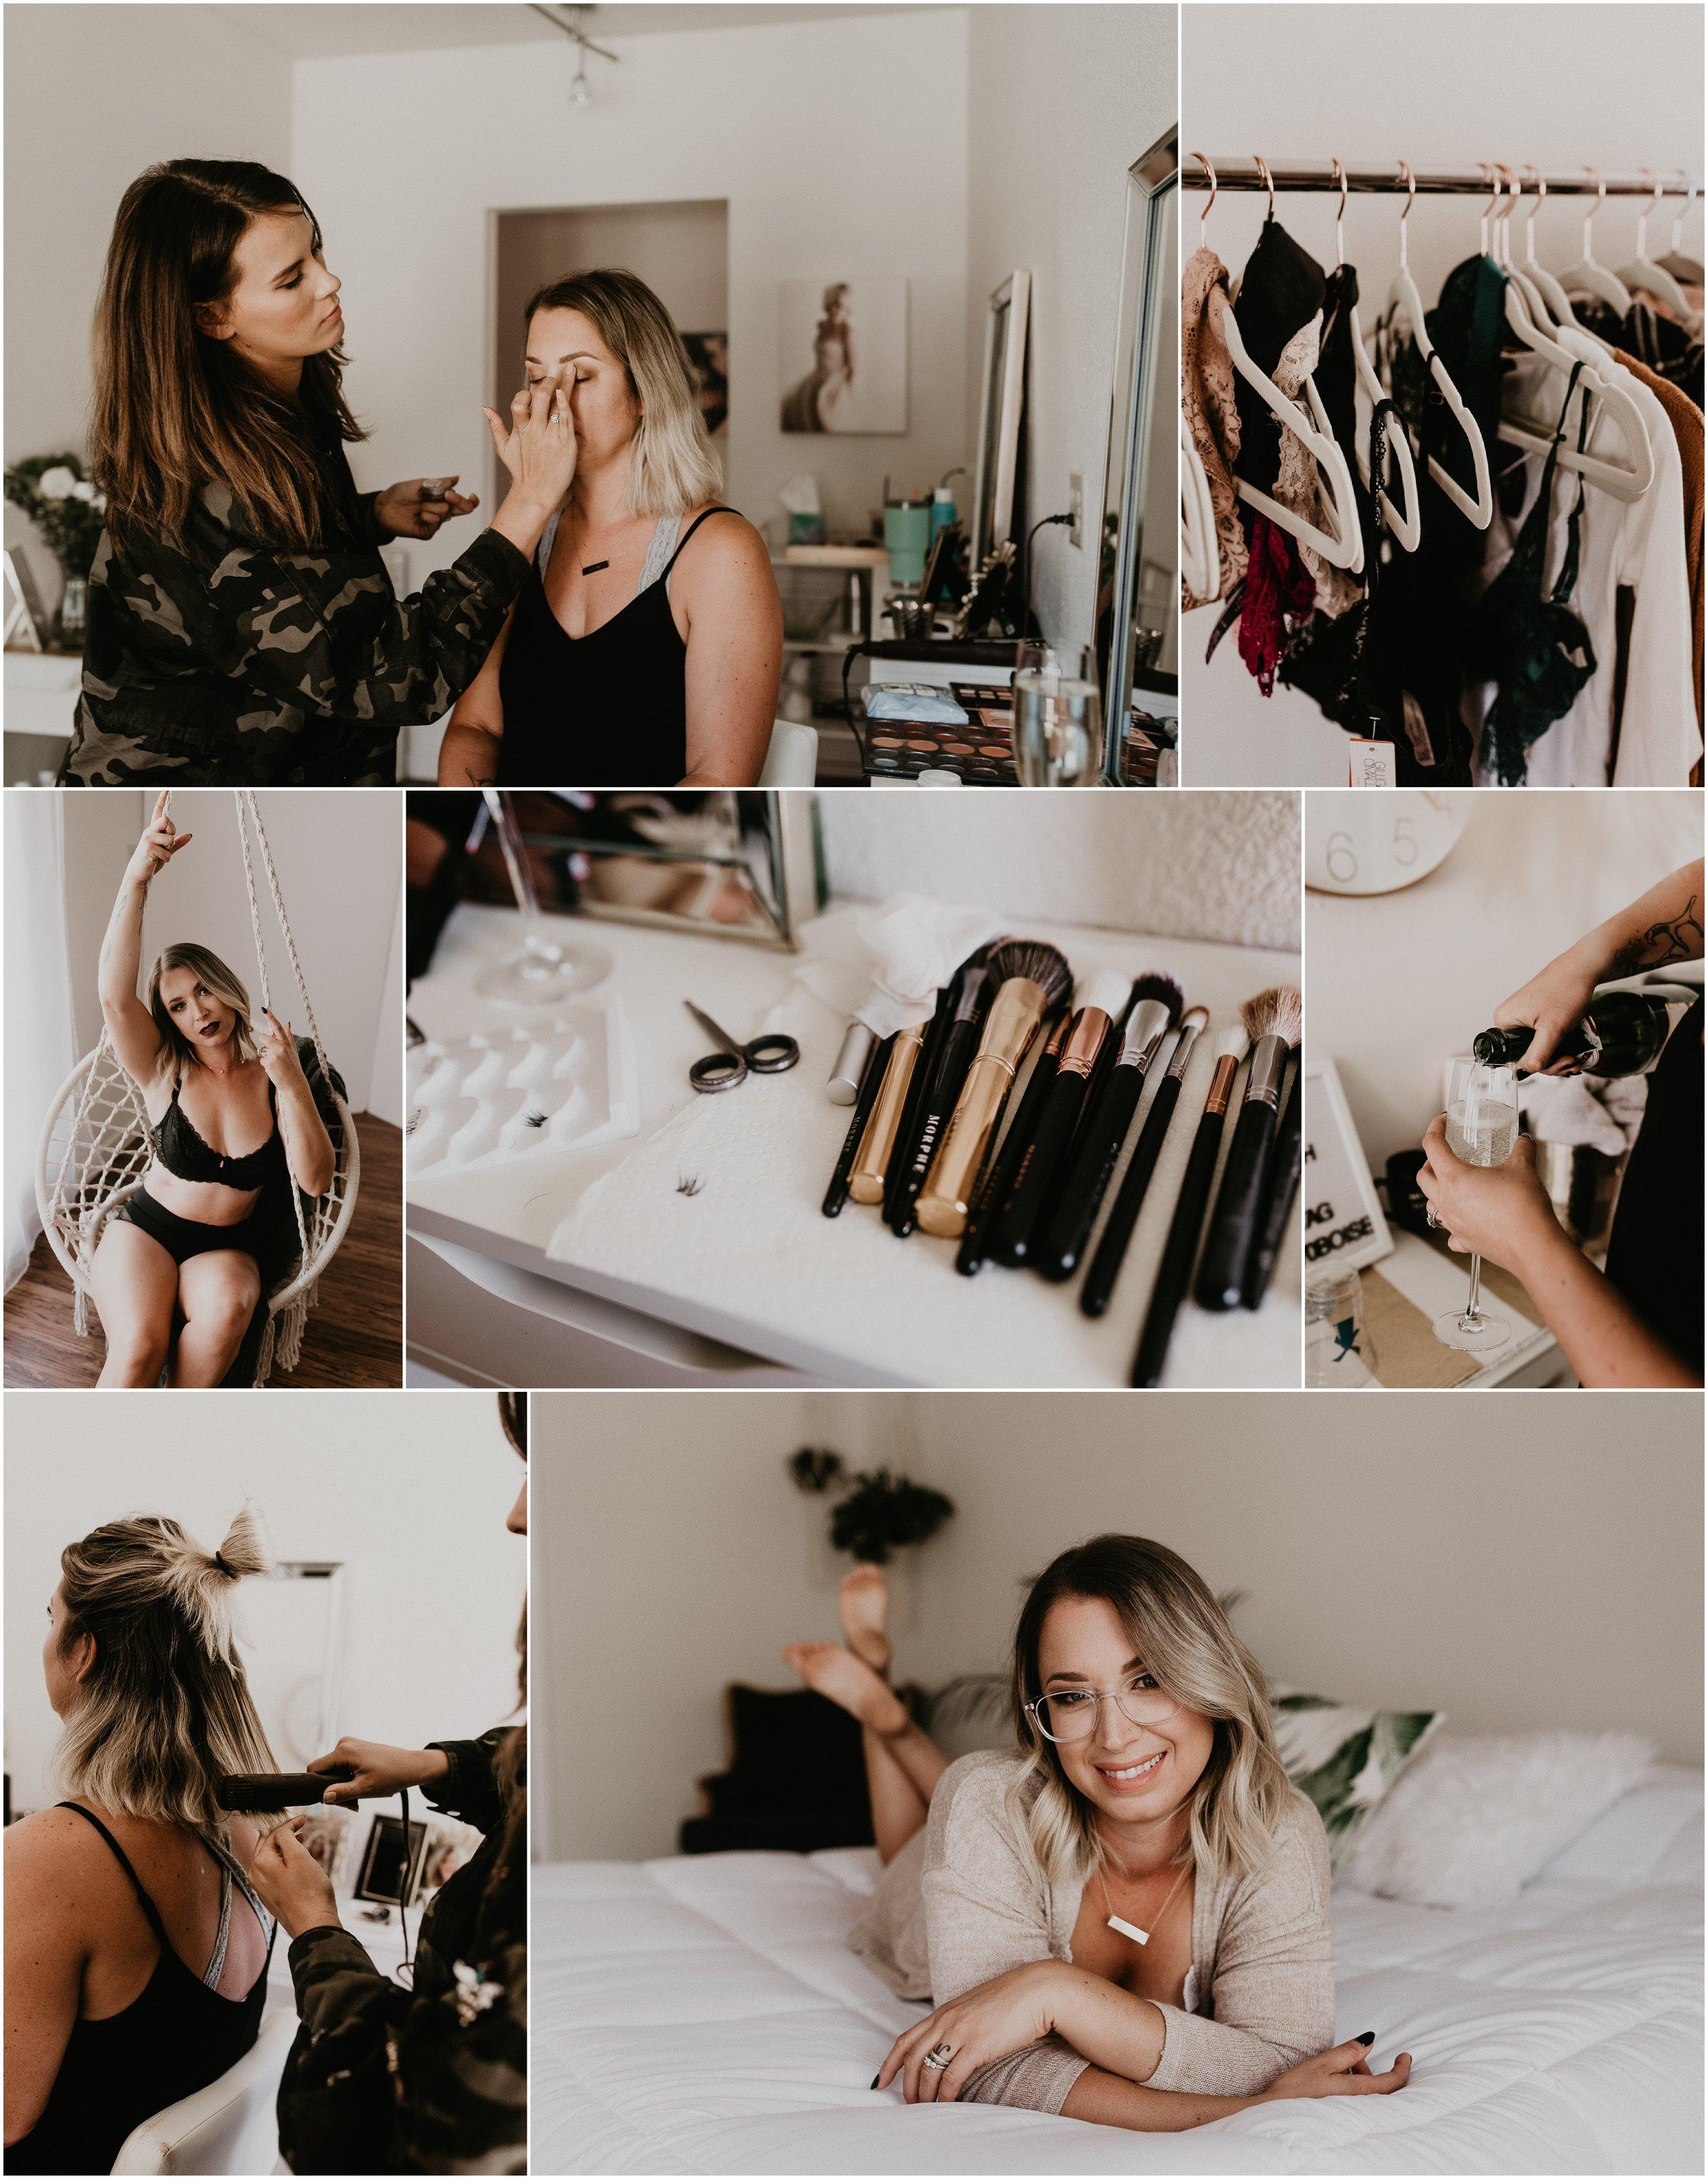 Boudoir By Kayla Boise Boudoir Photographer Makayla Madden Photography Behrens Artistry Hair and Makeup Idaho Boudoir Studio 870 Studio Boudoir Makeup Room